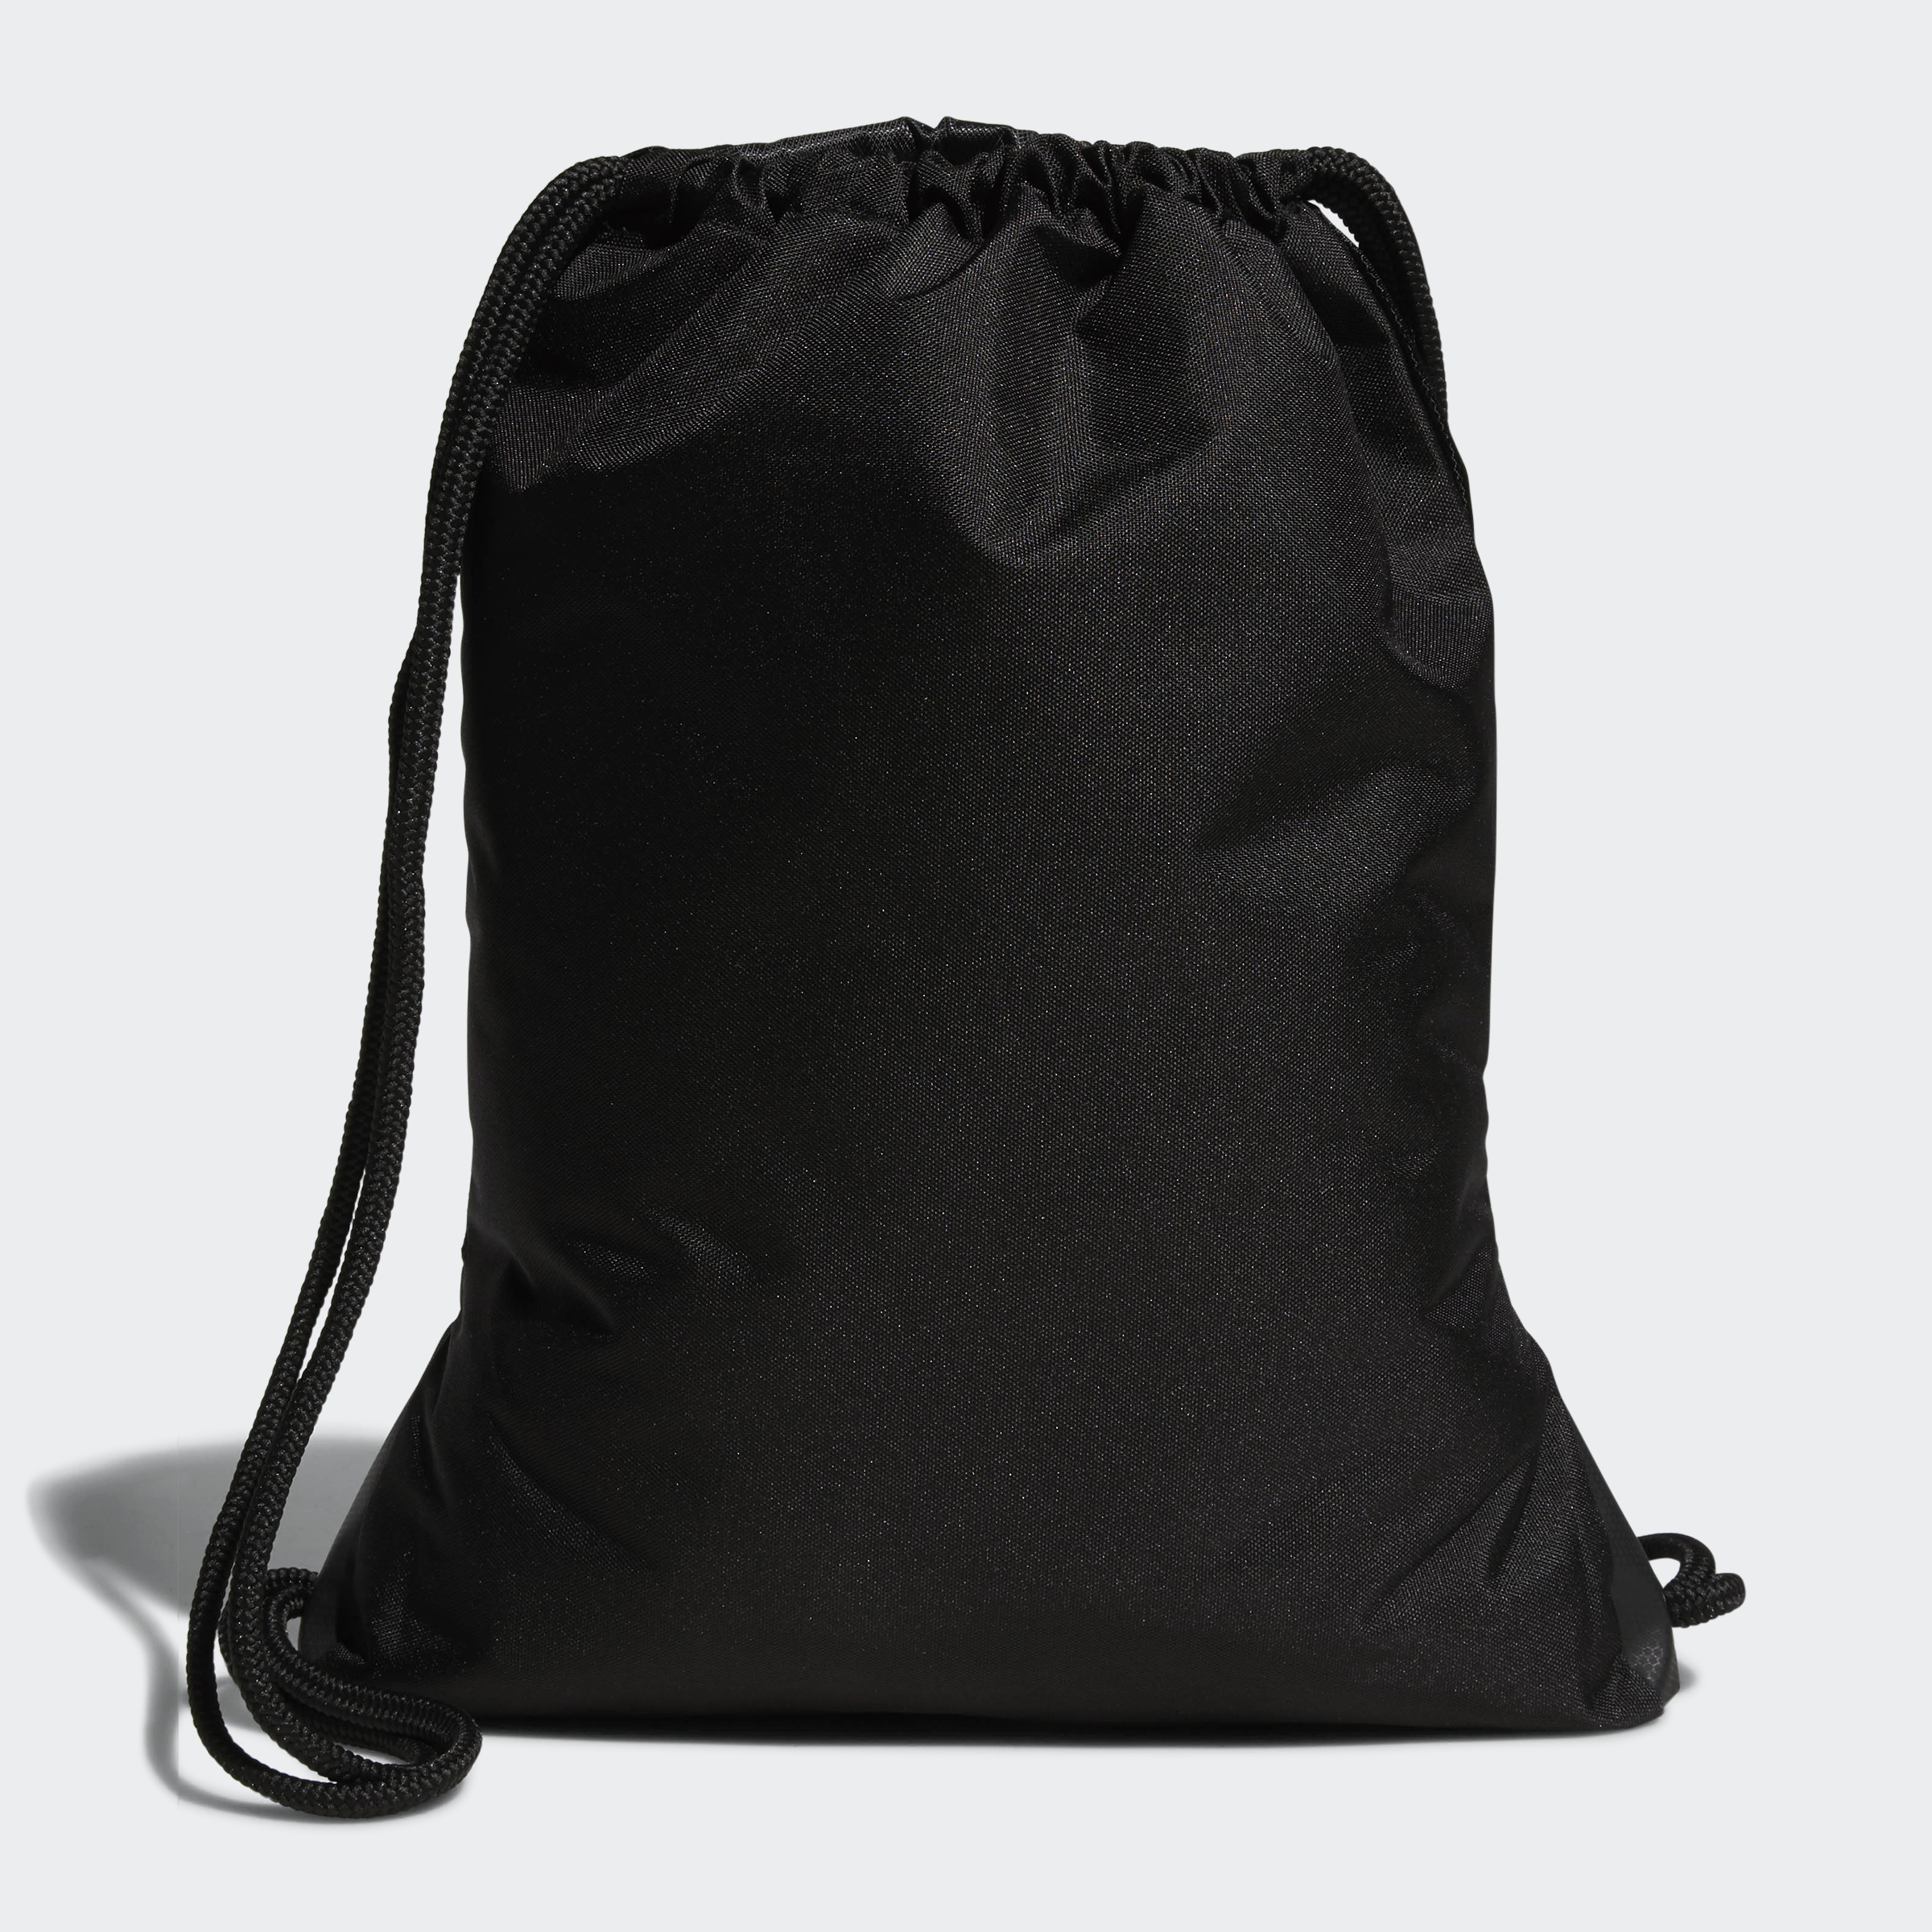 adidas-Lightning-Sackpack-Bags miniature 16